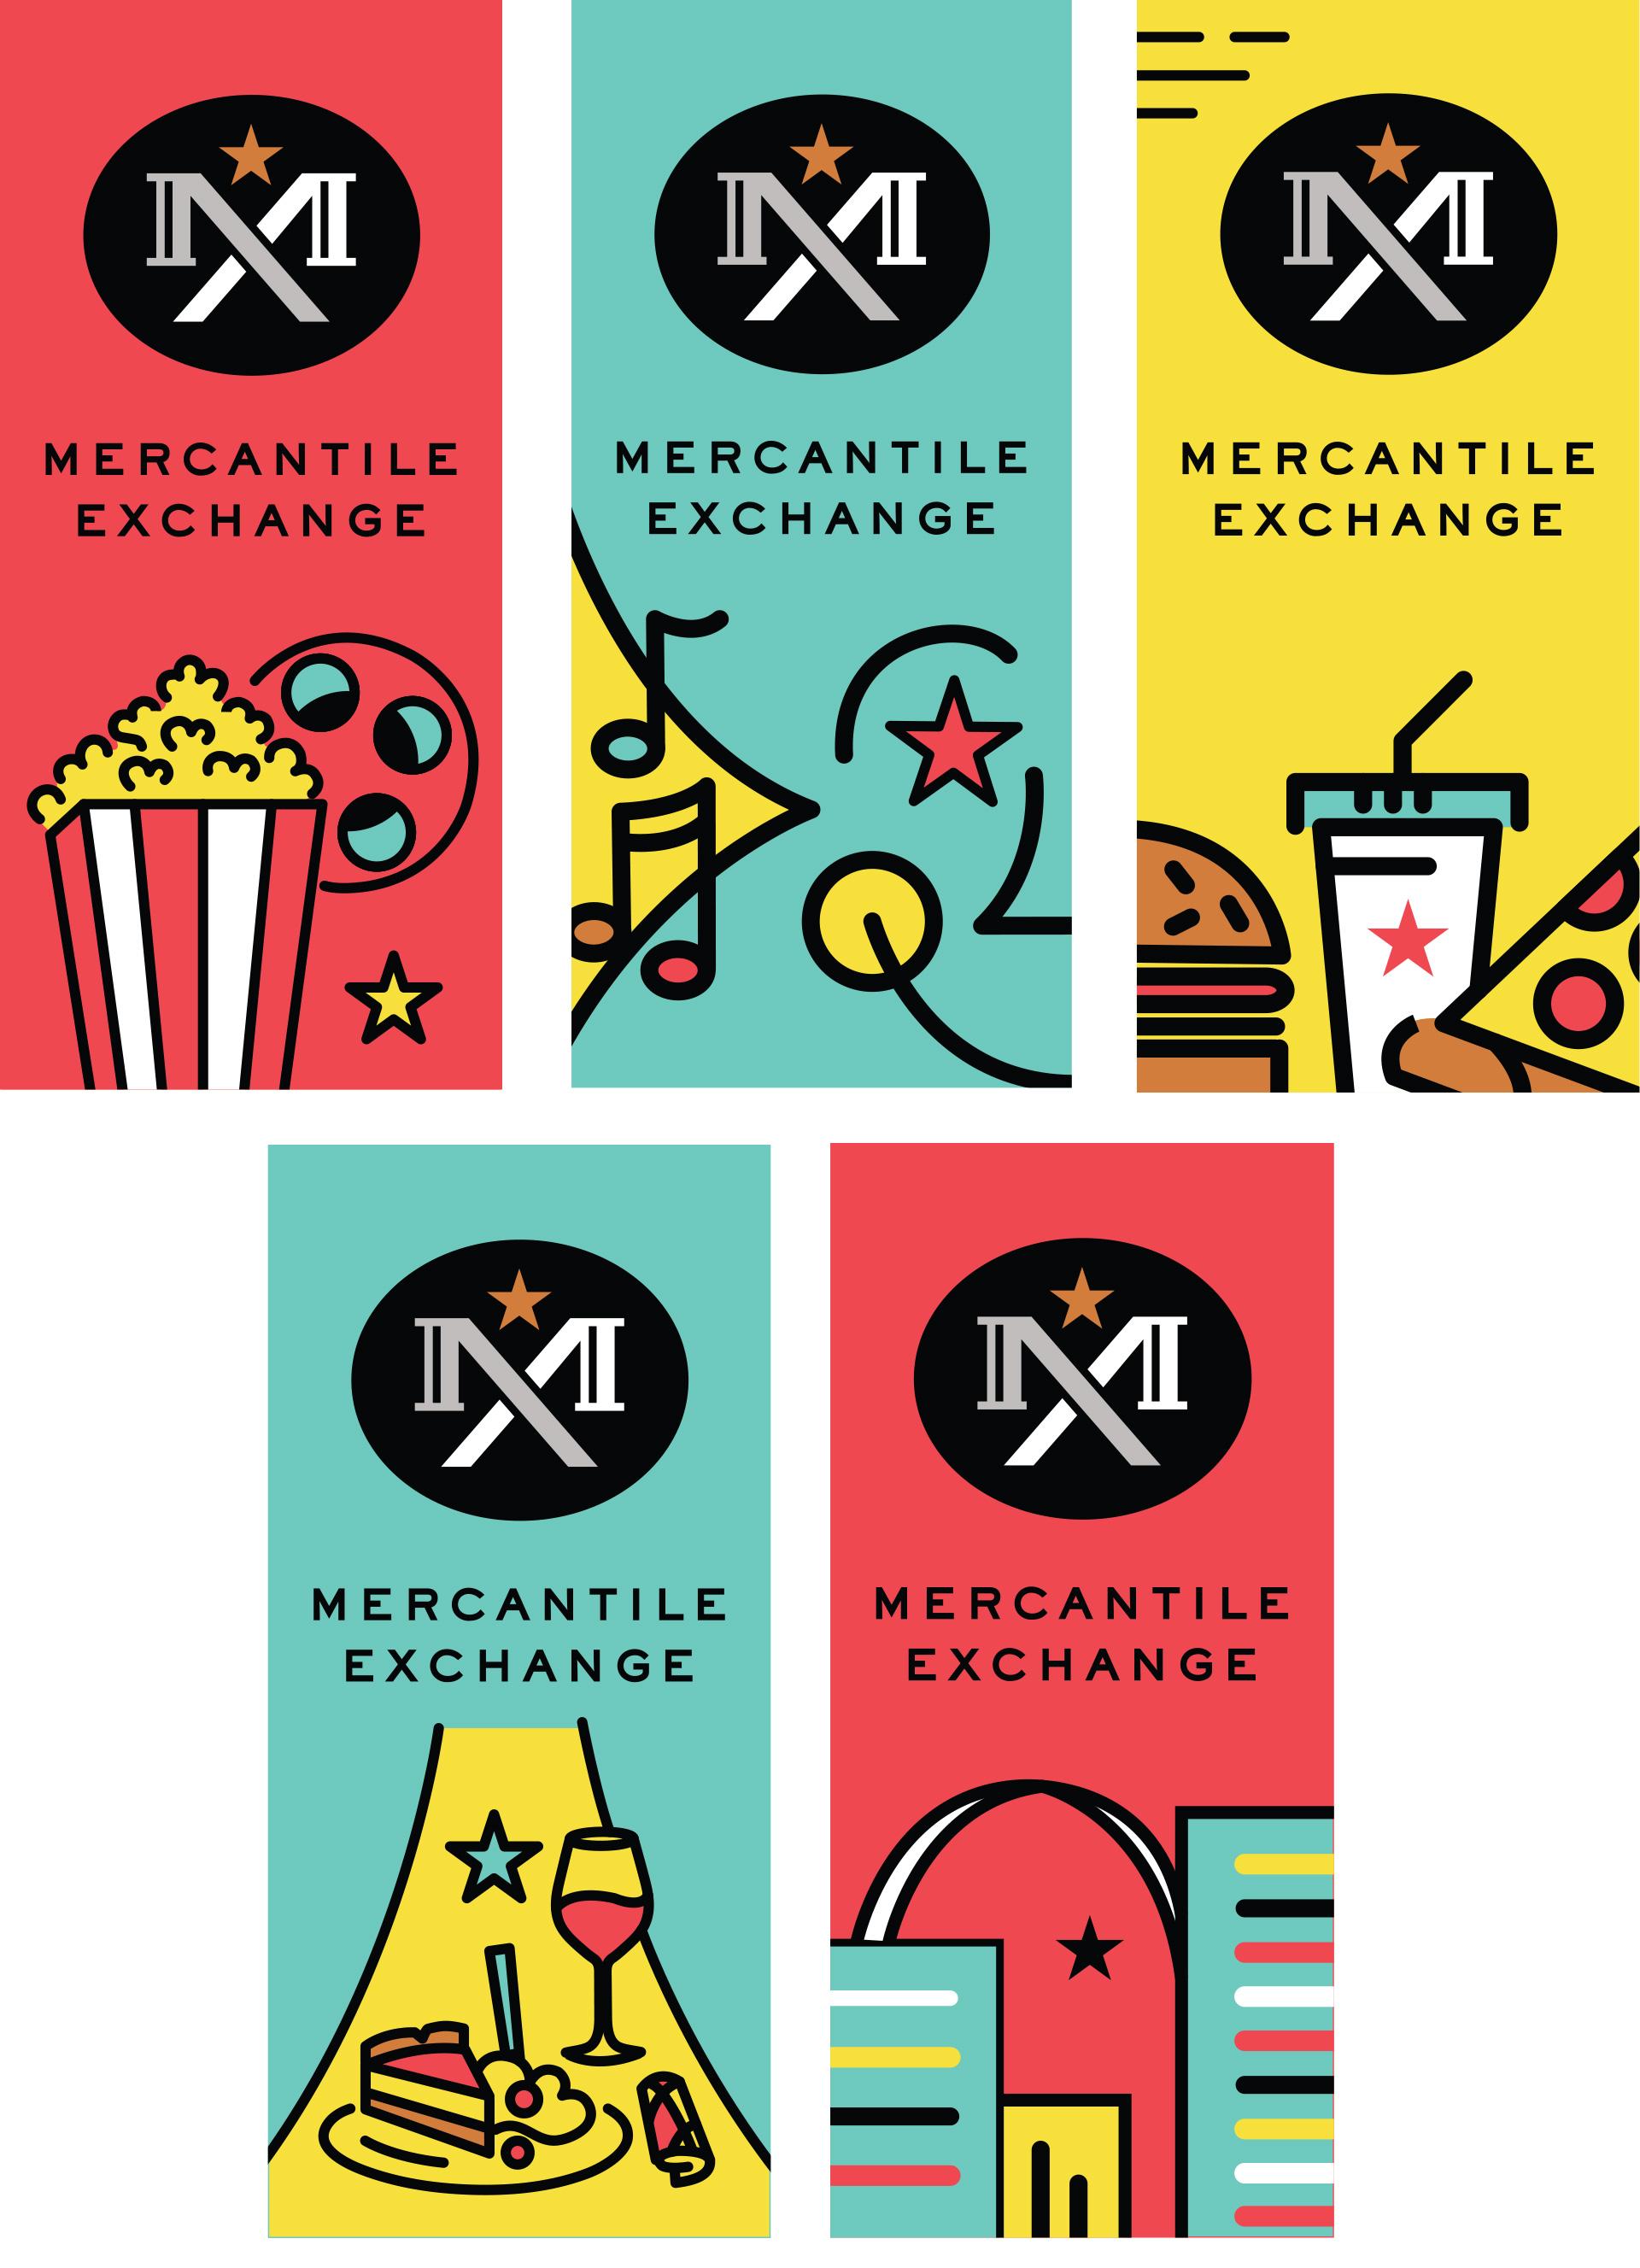 Atomicdust-Mercantile-Exchange-Banner-Design-Composition.jpg